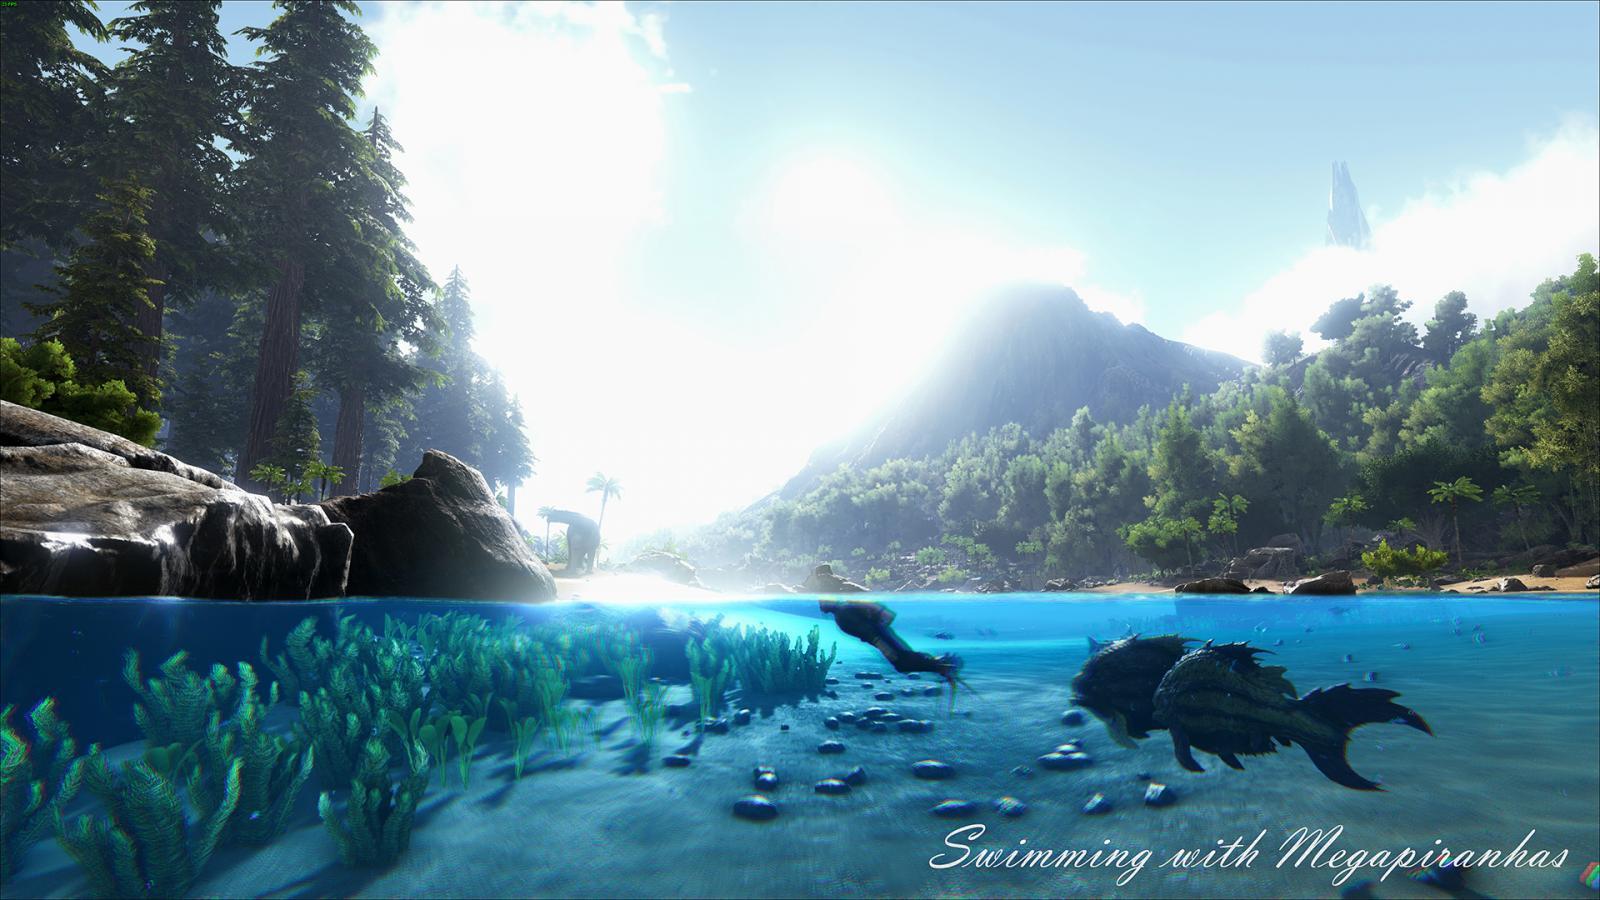 large.58a7b080927b5_MRRadioactiv-SwimmingwithMegapiranhas-Freeform.jpg